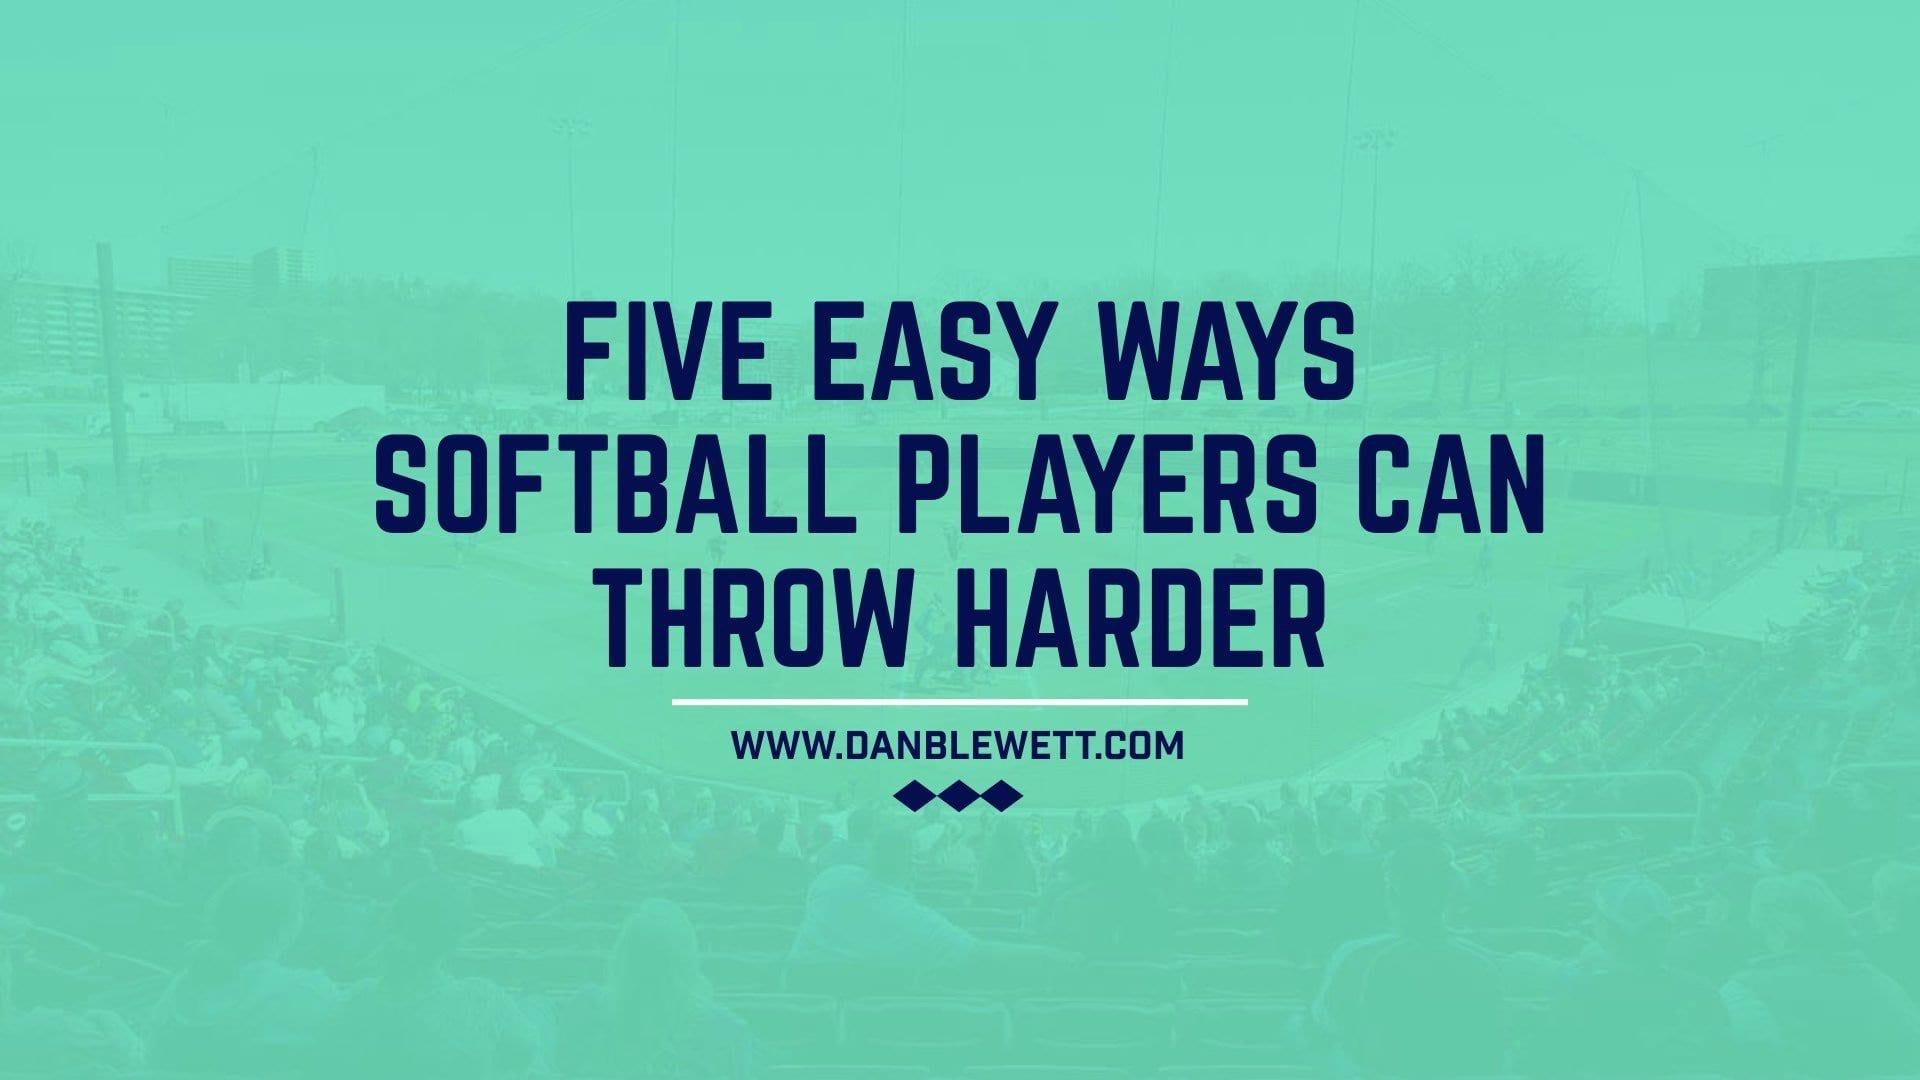 5 Easy Ways Softball Players Can Throw Harder - Coach Dan